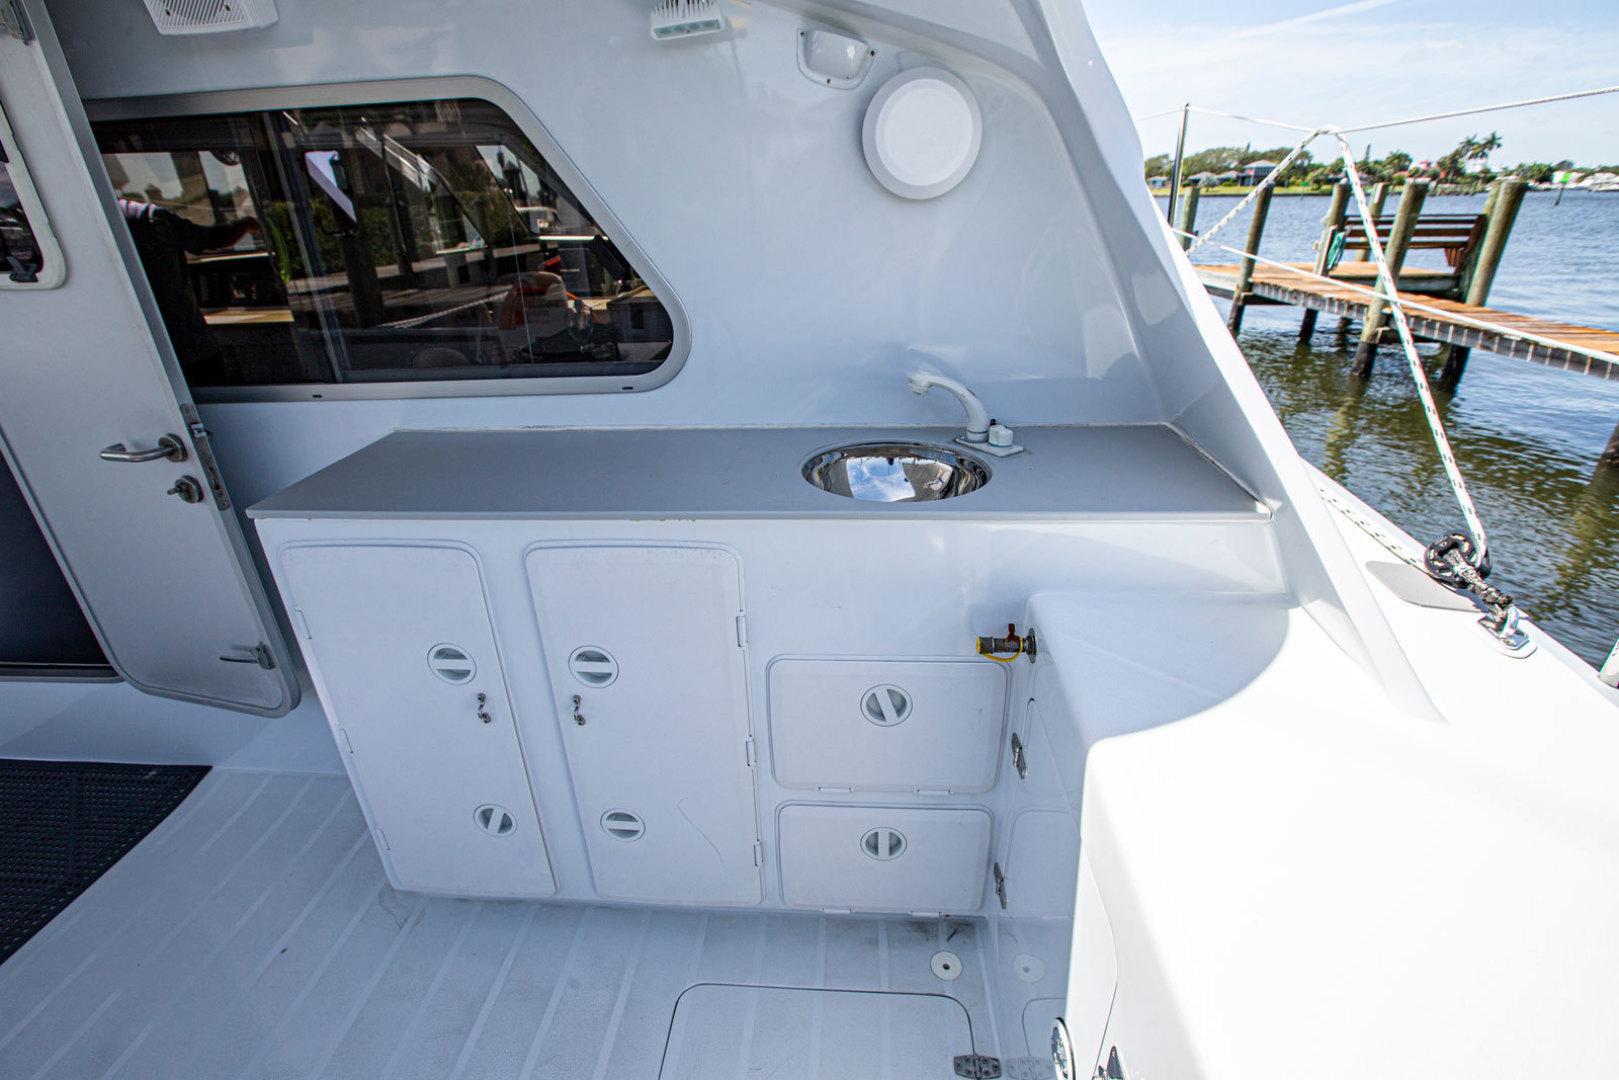 Atlantic-49 Catamaran 2018-Wabi Sabi Stuart-Florida-United States-1399257 | Thumbnail